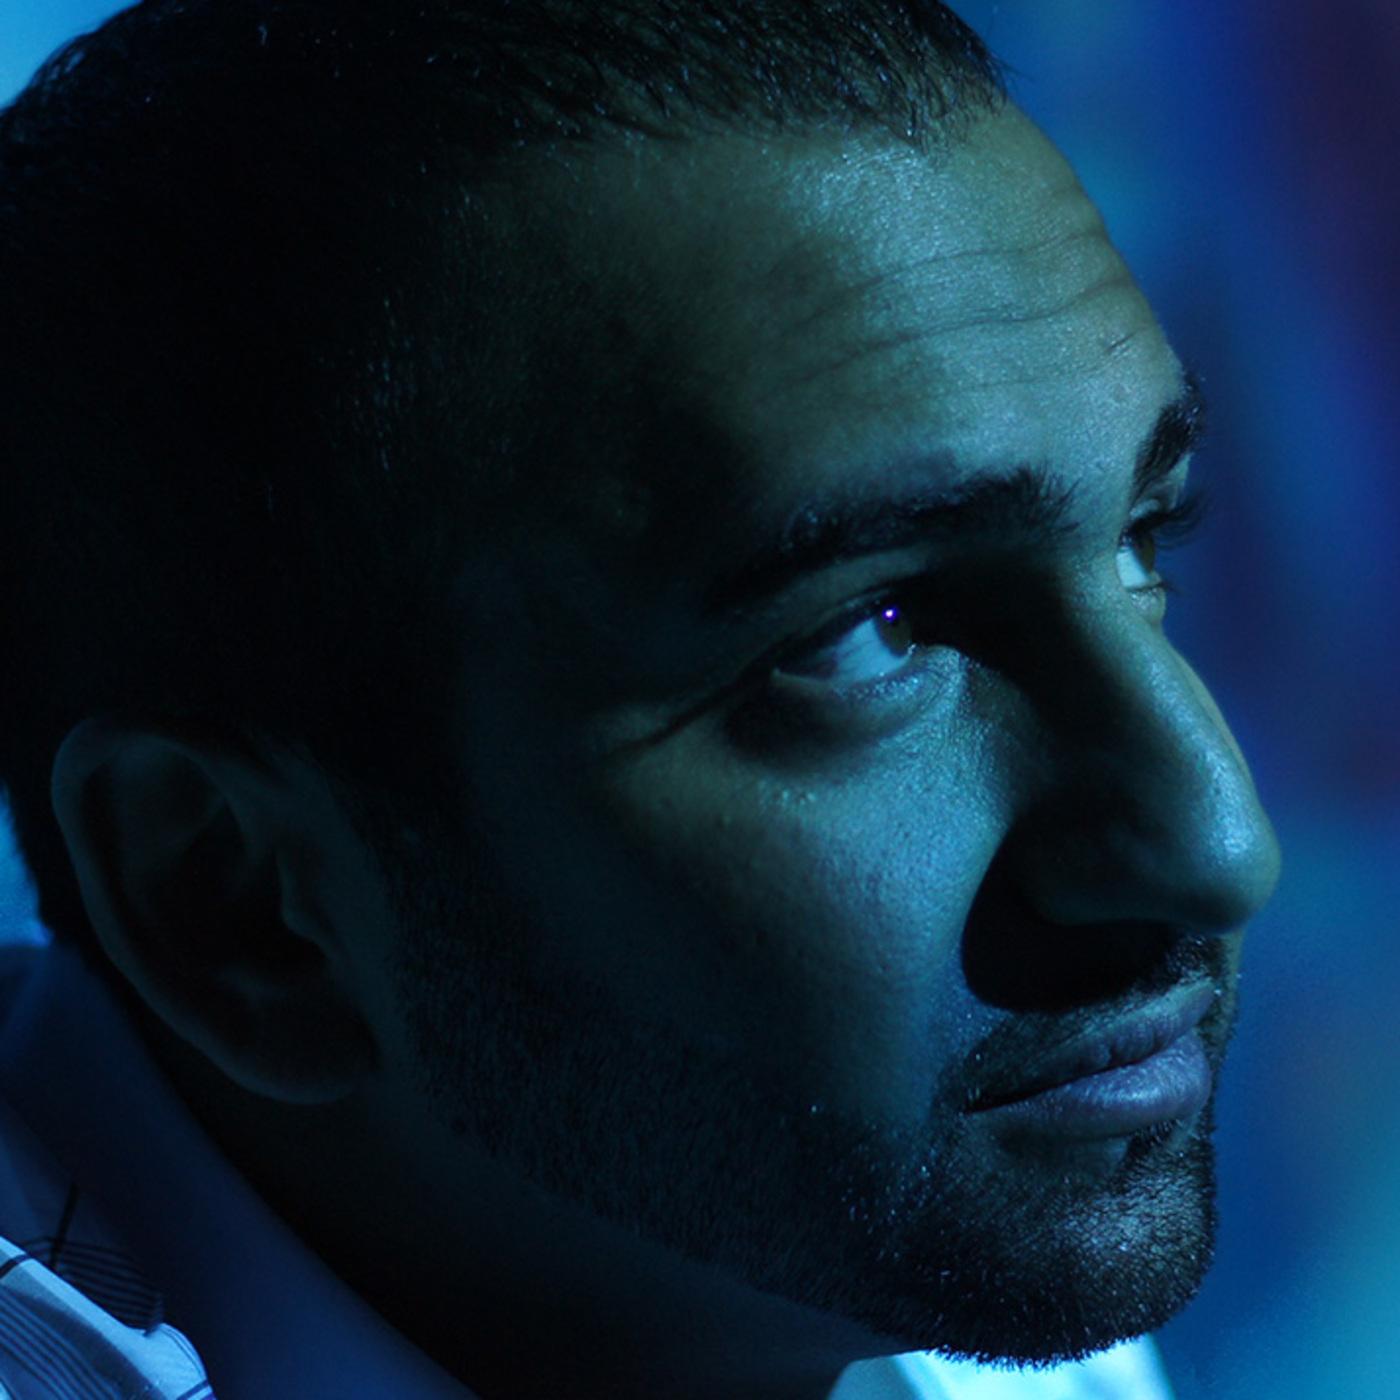 Anuj Rastogi Interview with DesiYUP